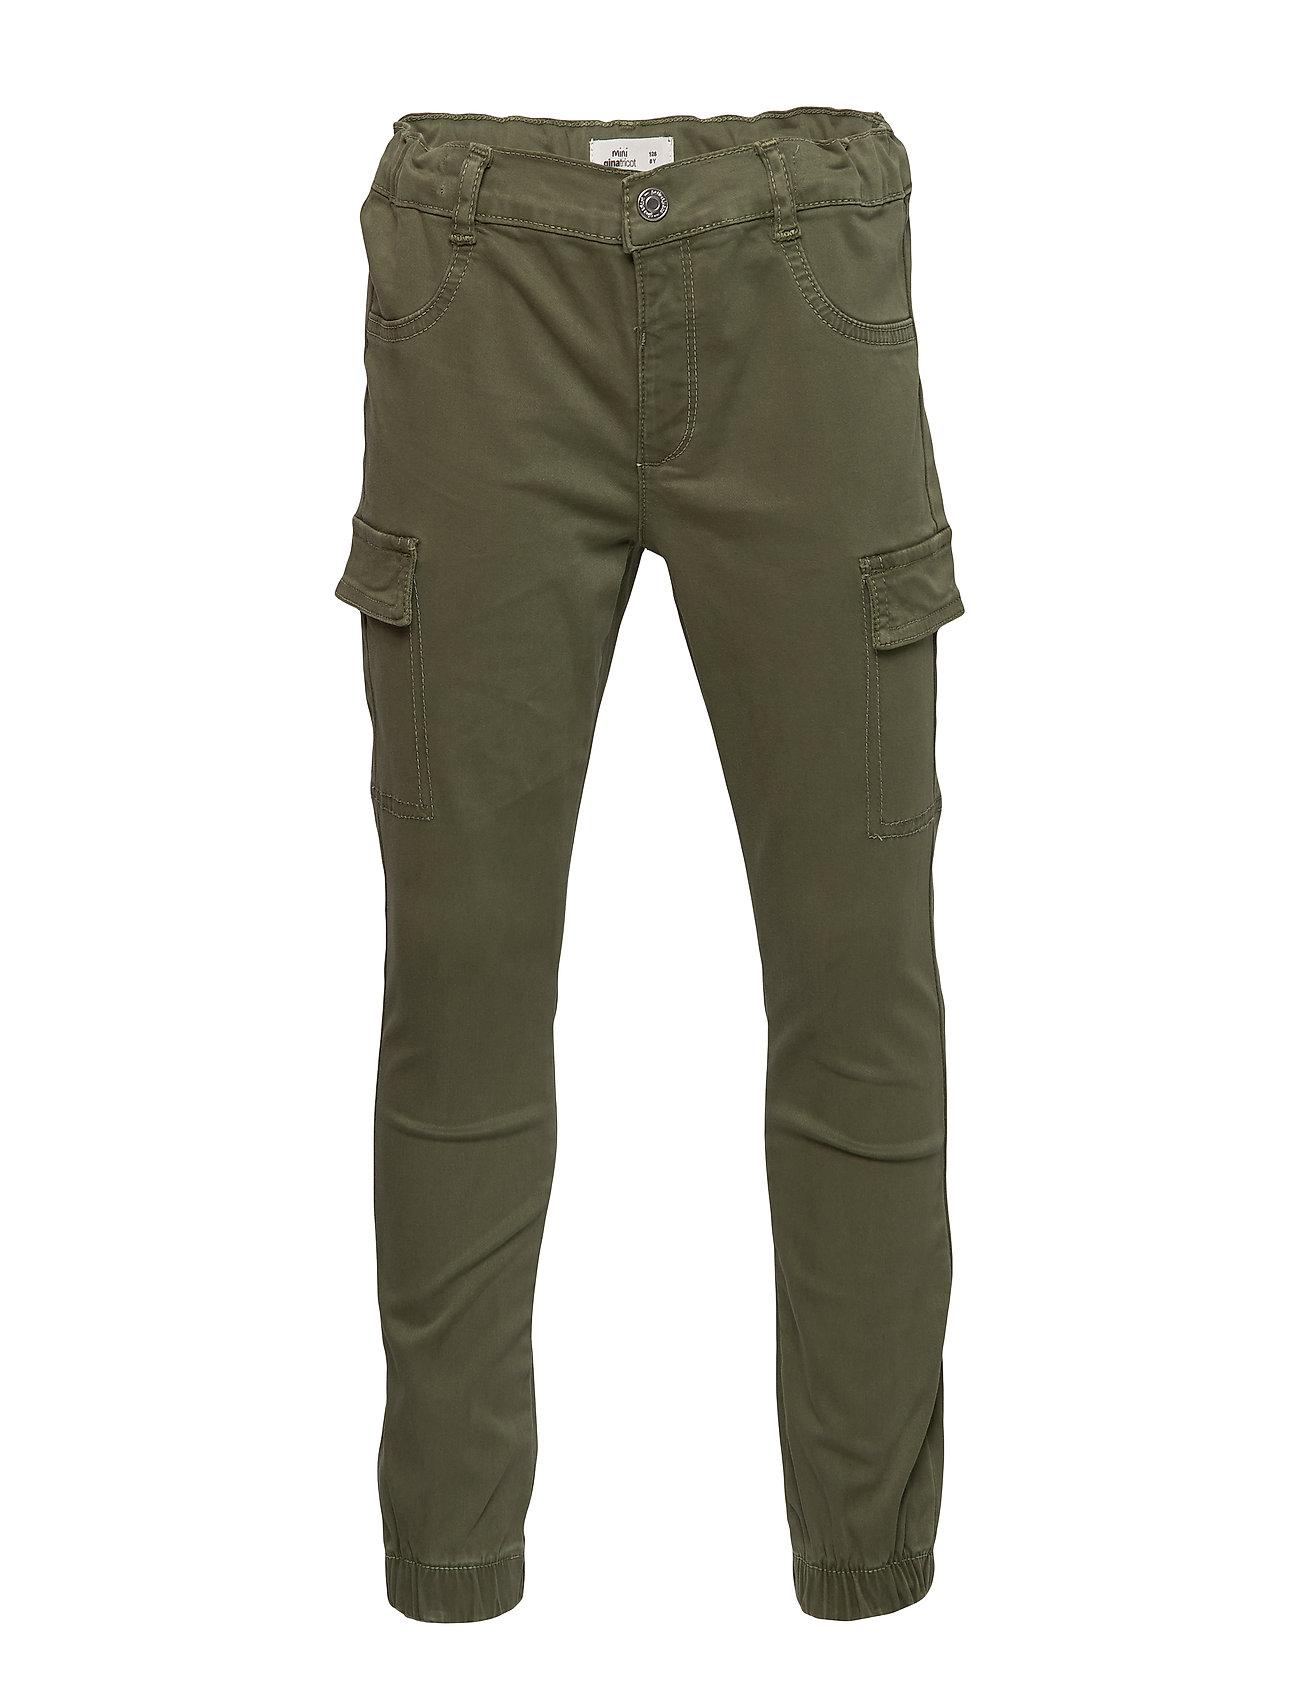 Gina Tricot Mini cargo trousers - CARGO GREEN